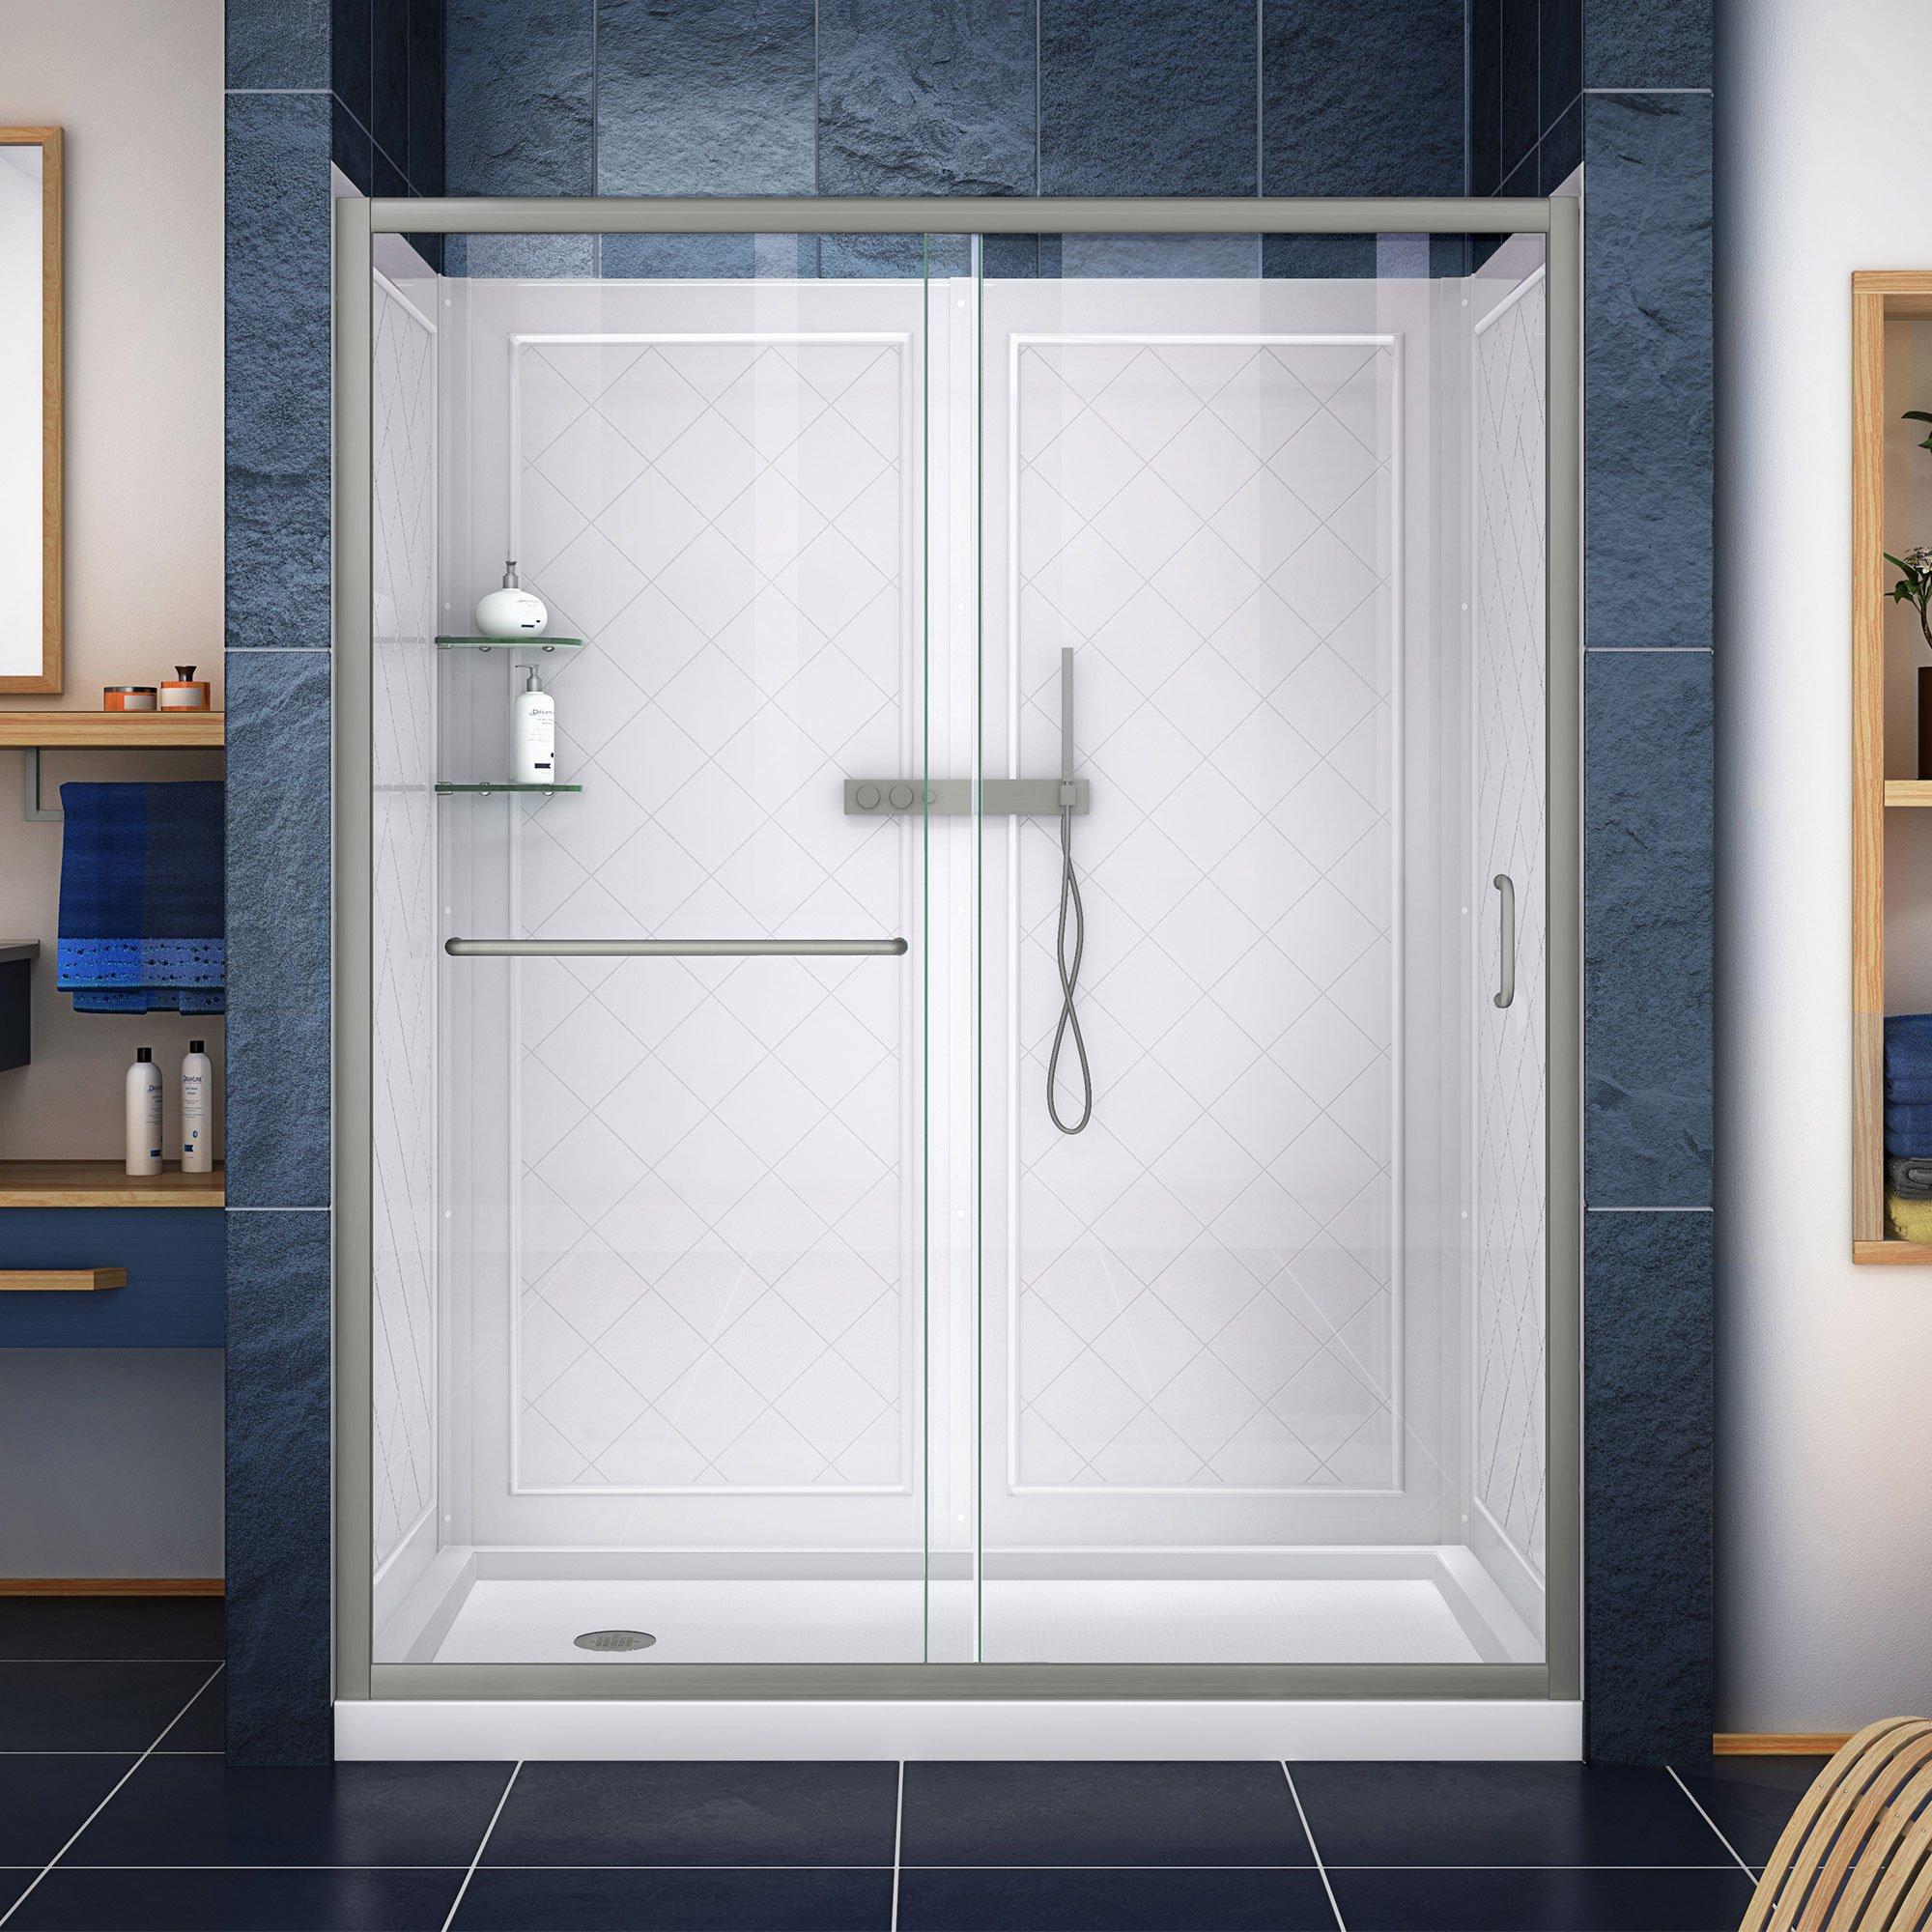 Dreamline Dl 6119l 04cl Shower Door Base And Backwalls 36 In D X 60 In W Brushed Nickel Walk In Shower Kits Amazon Com